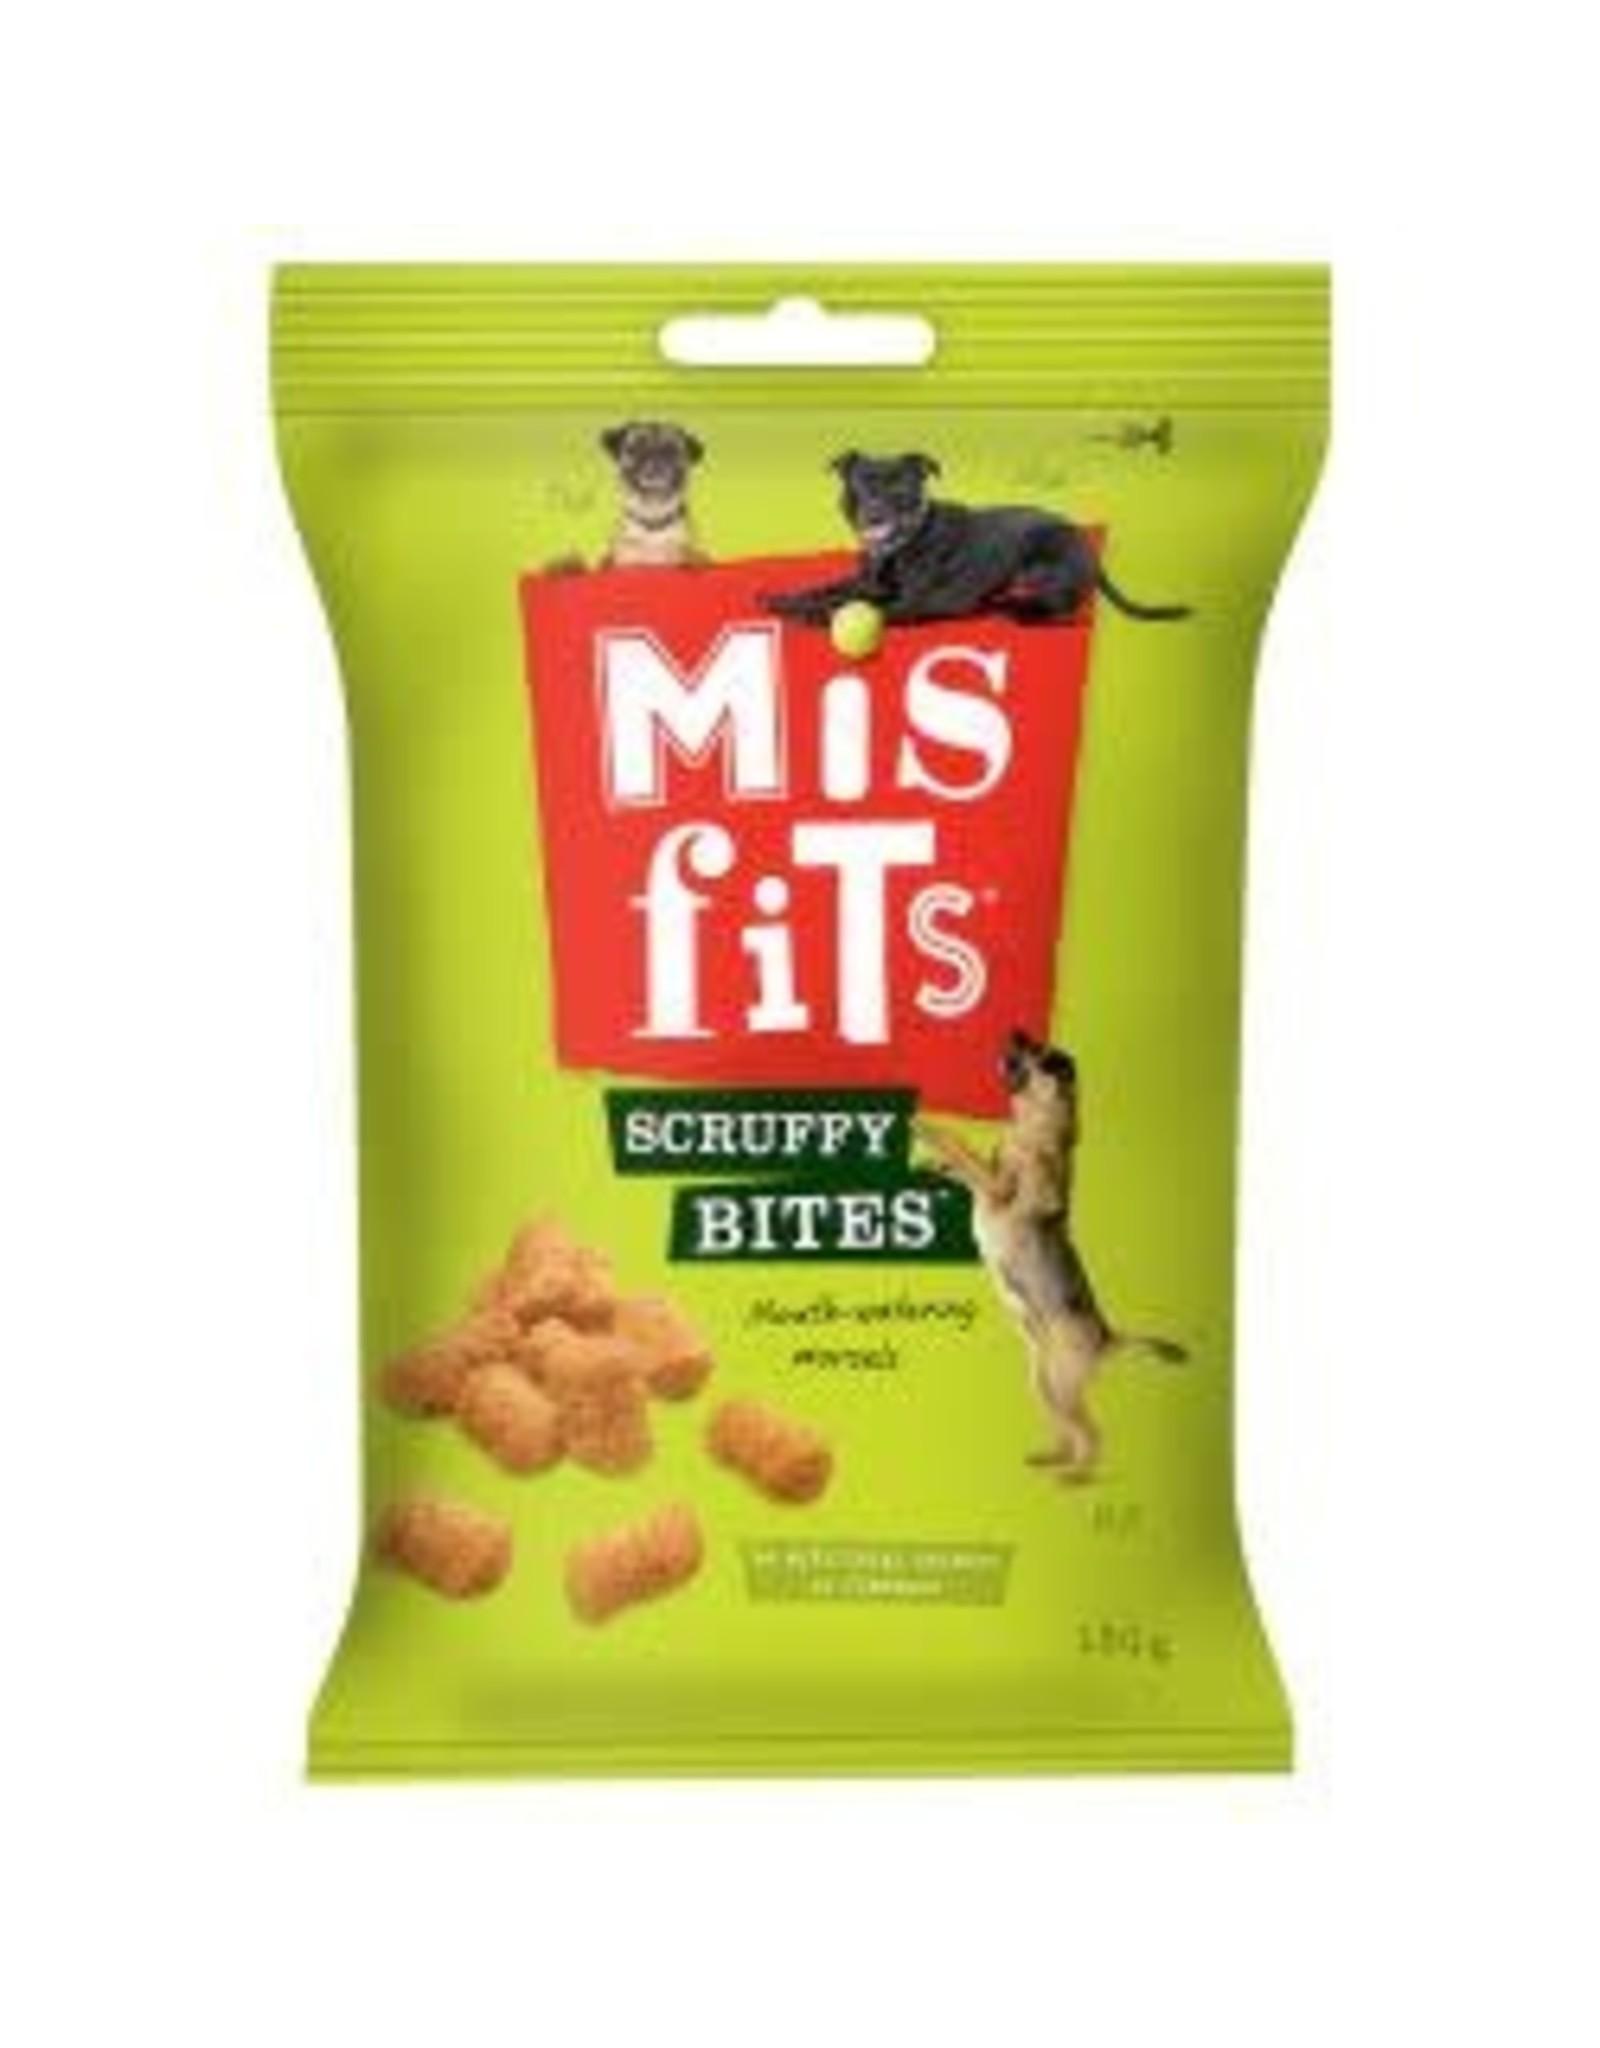 Misfits Misfits Scruffy Bites 180g